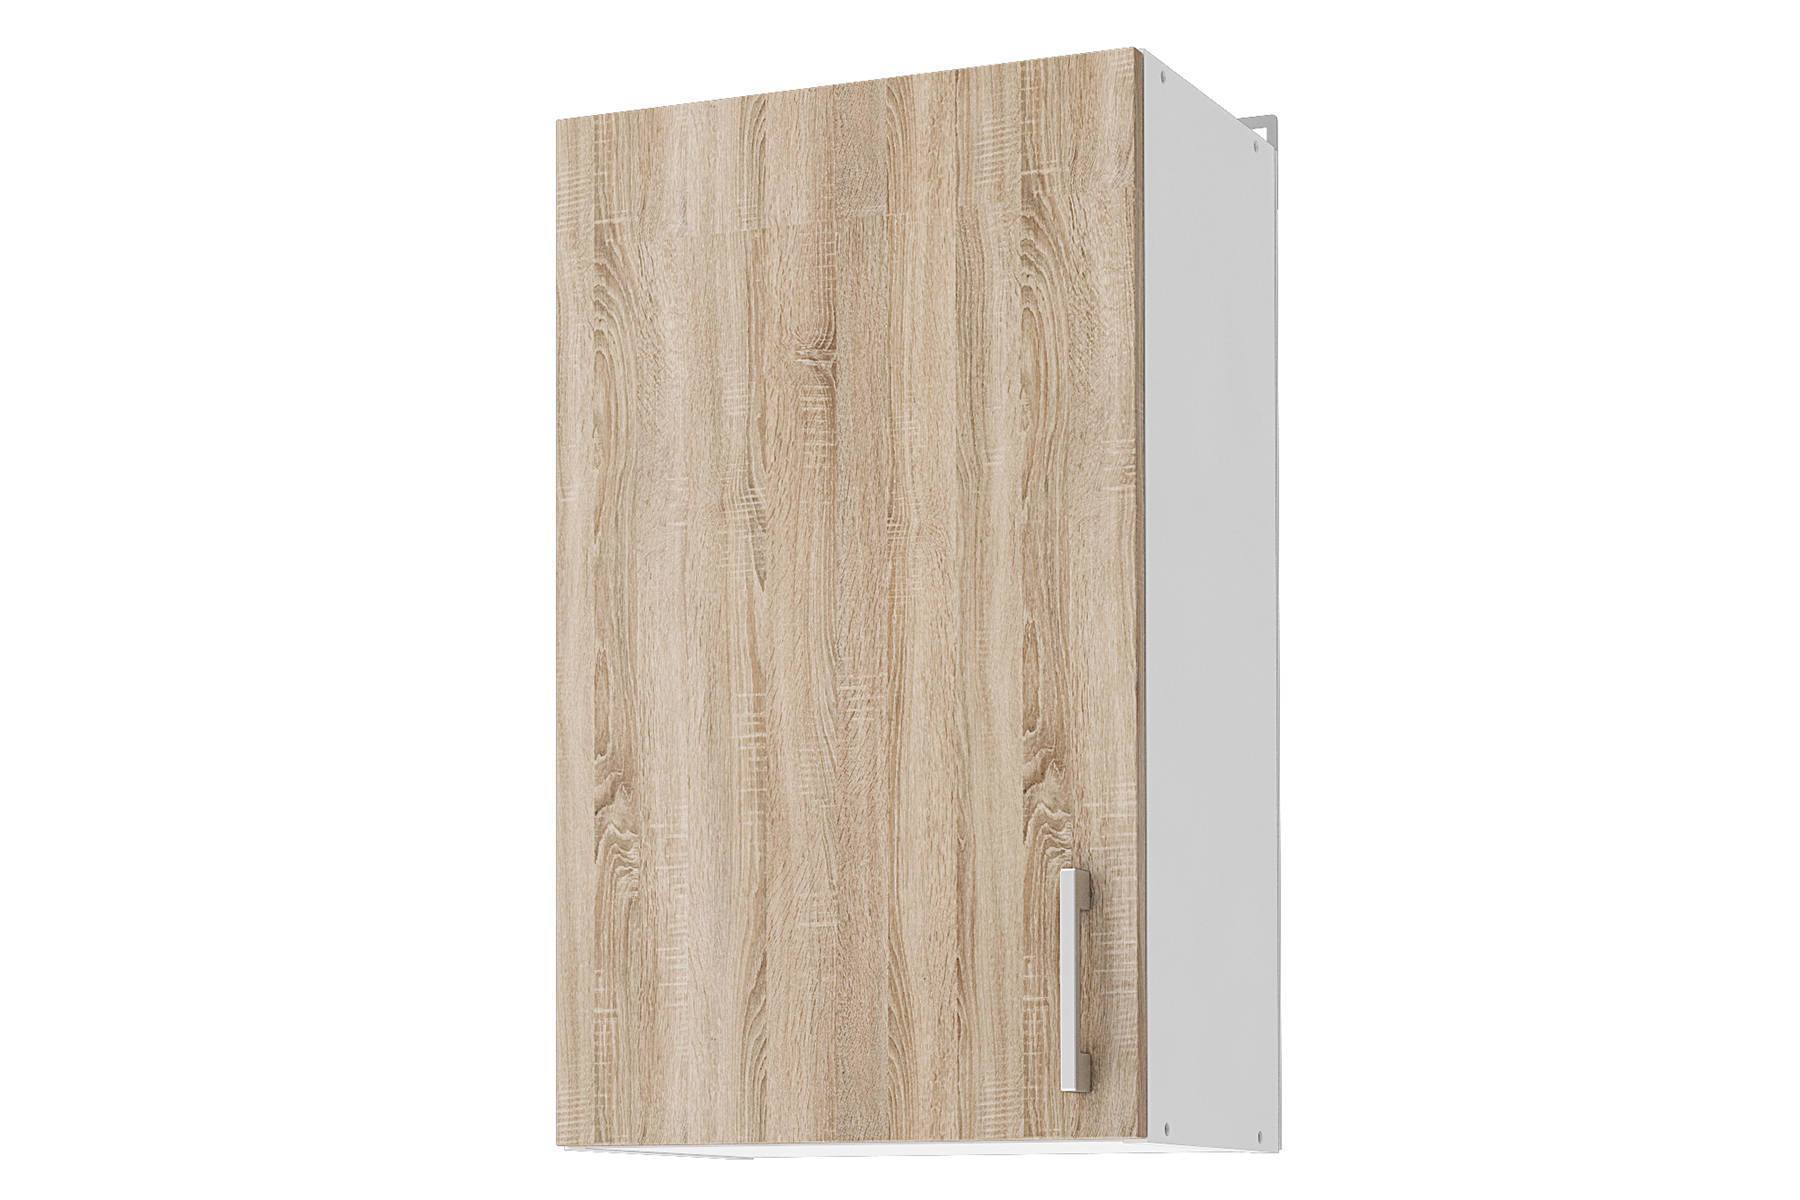 Шкаф навесной Уют СТЛ.275.01 шкаф навесной ультра